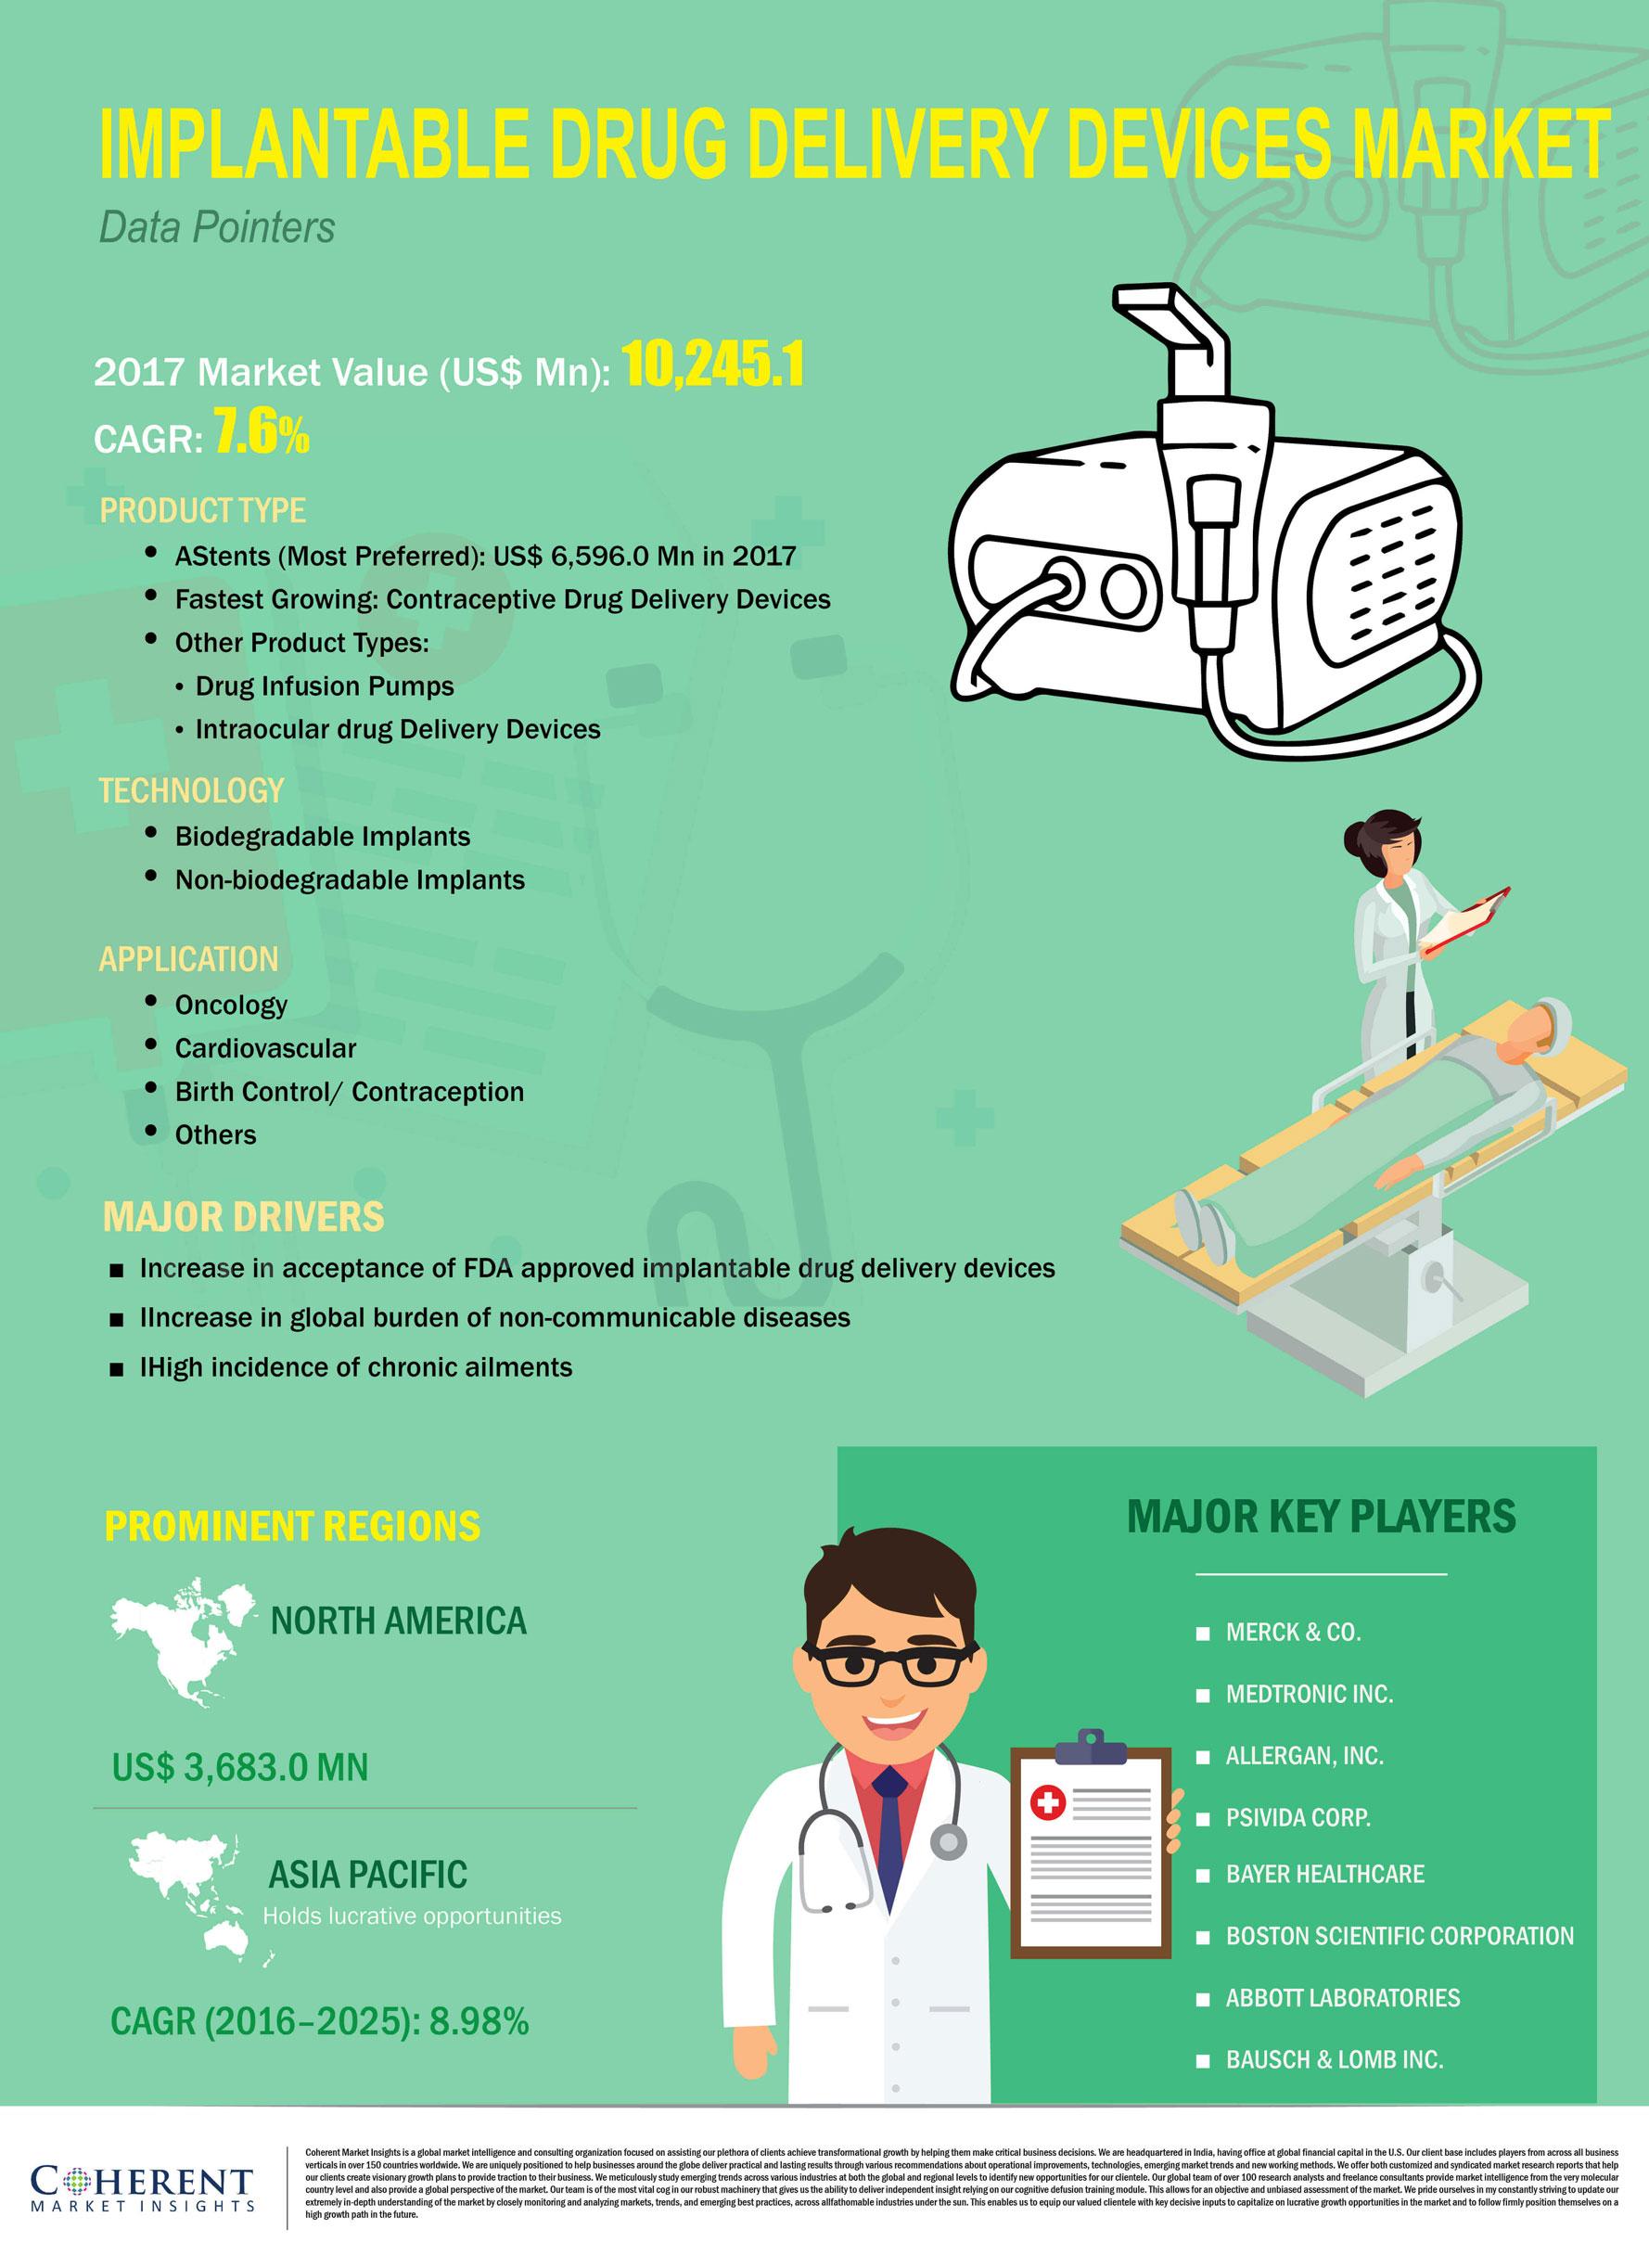 Implantable Drug Delivery Devices Market Size, Trends, Shares, Insights, Forecast - Coherent Market Insights